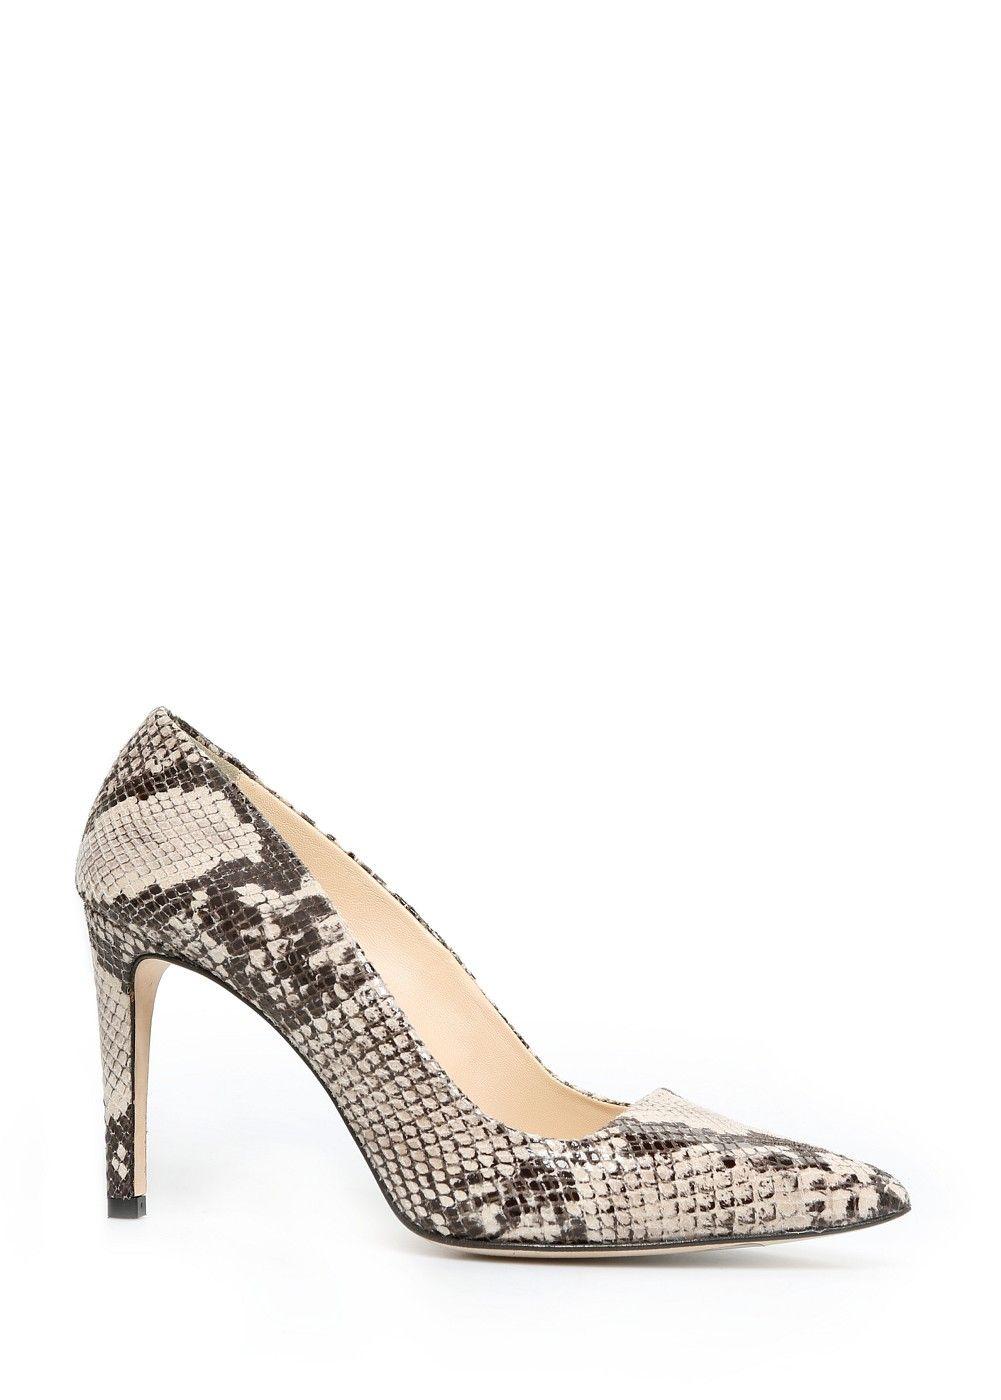 c1087f8f4ab Zapato serpiente piel - Tallas grandes